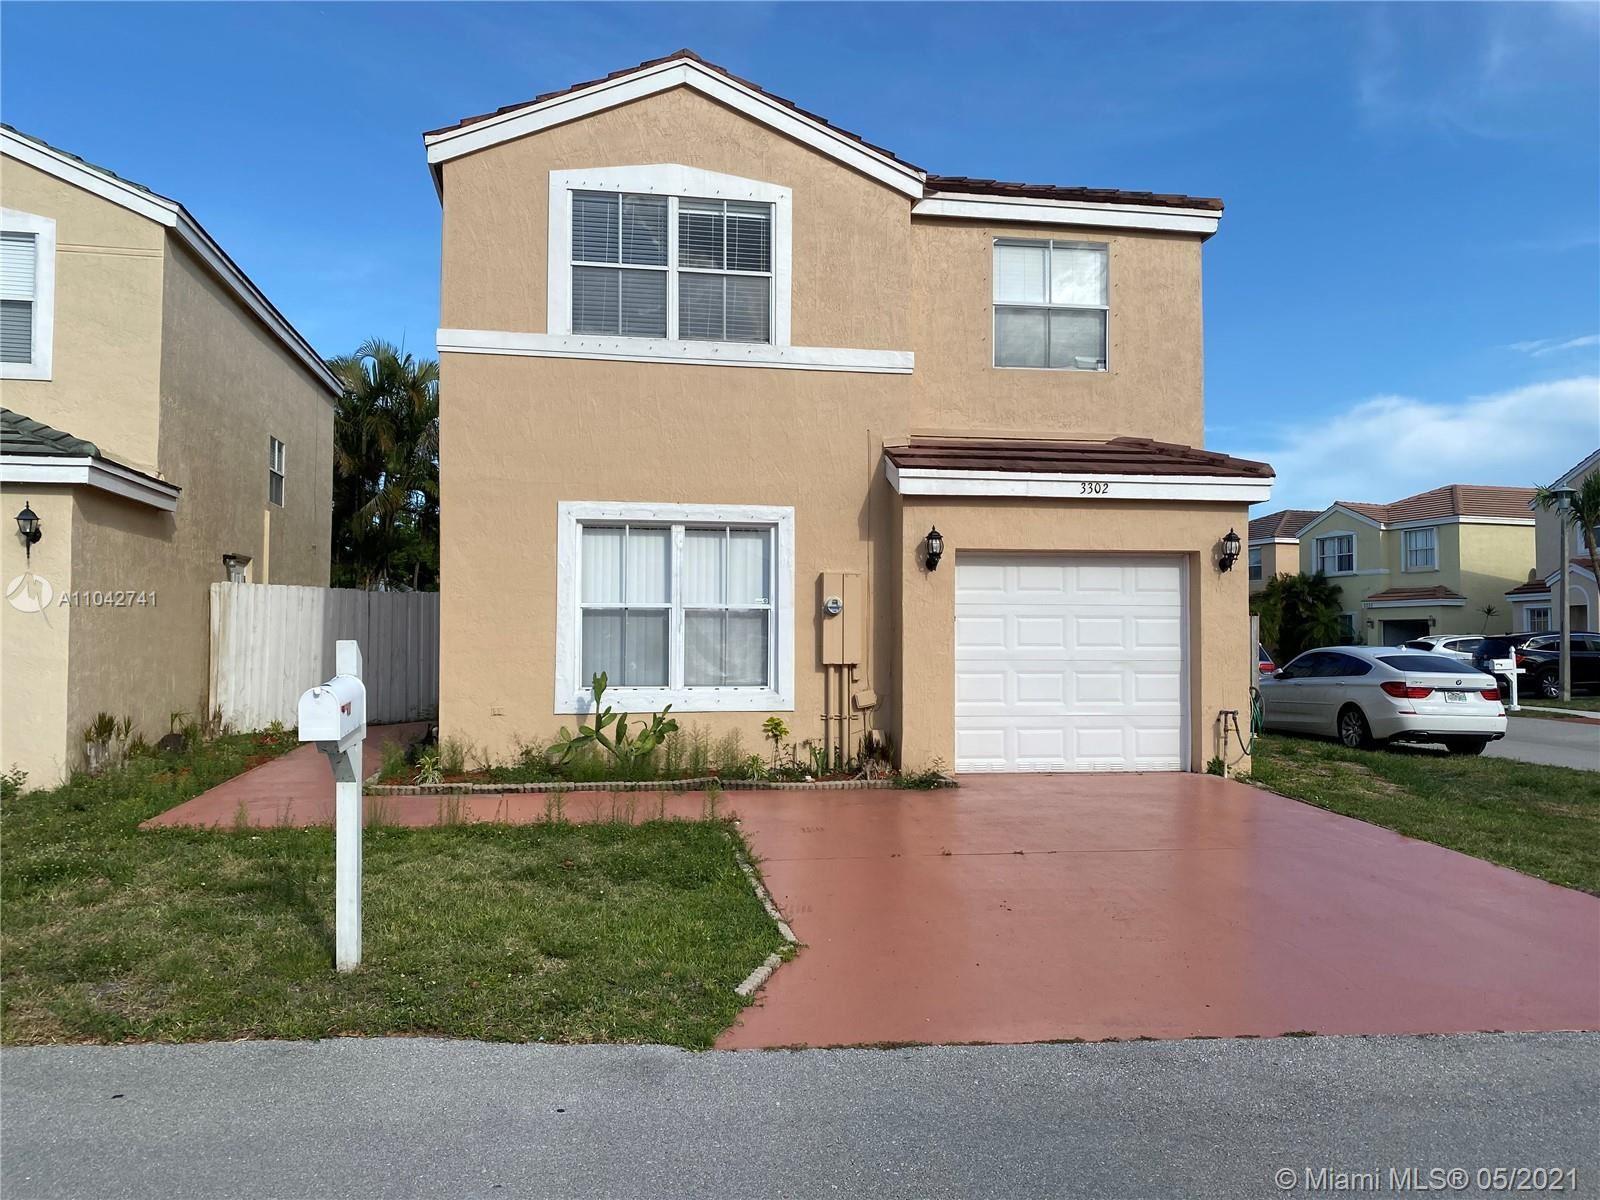 Photo of 3302 Indian Key Blvd, Margate, FL 33063 (MLS # A11042741)